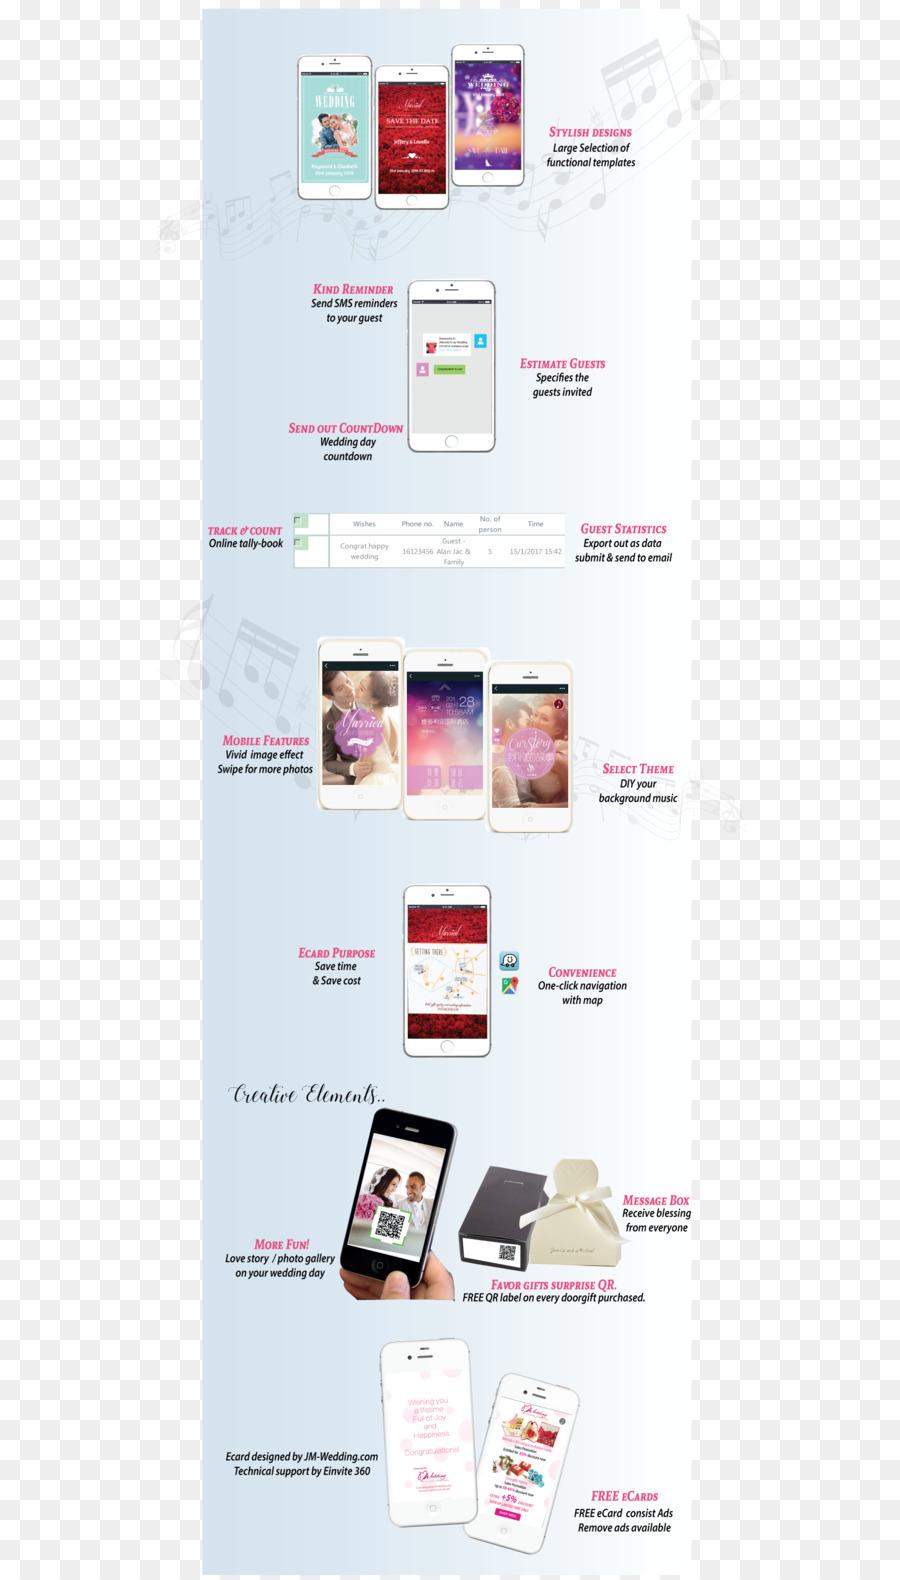 Wedding invitation E-card - wedding png download - 1774*3104 - Free ...